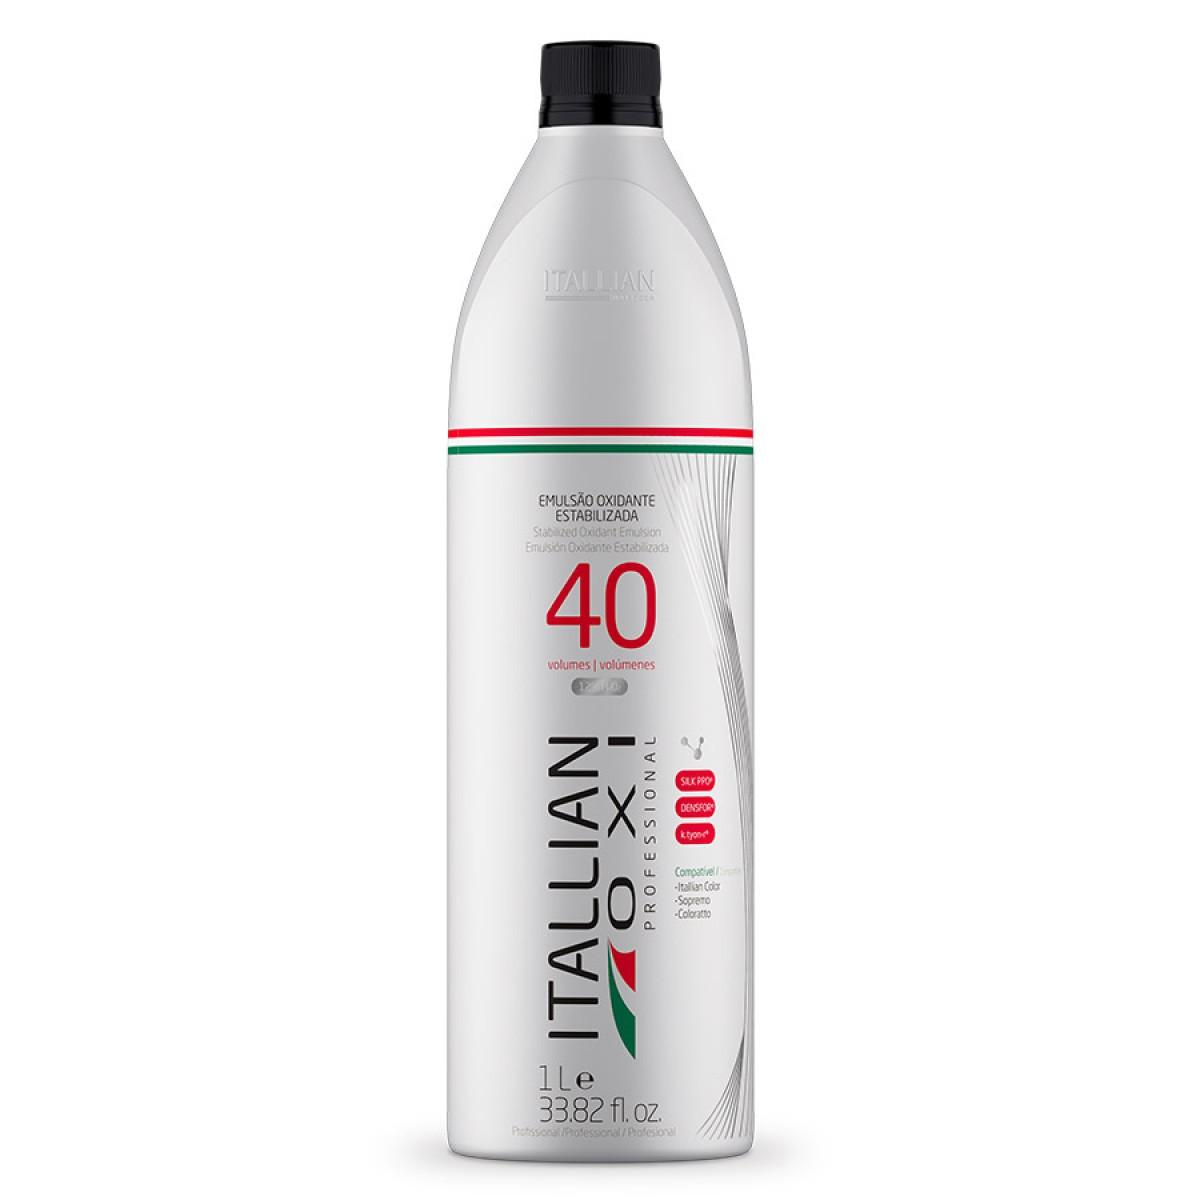 Kit Pó Descolorante Itallian Color Premium Profissional + 2 Ox 40vol